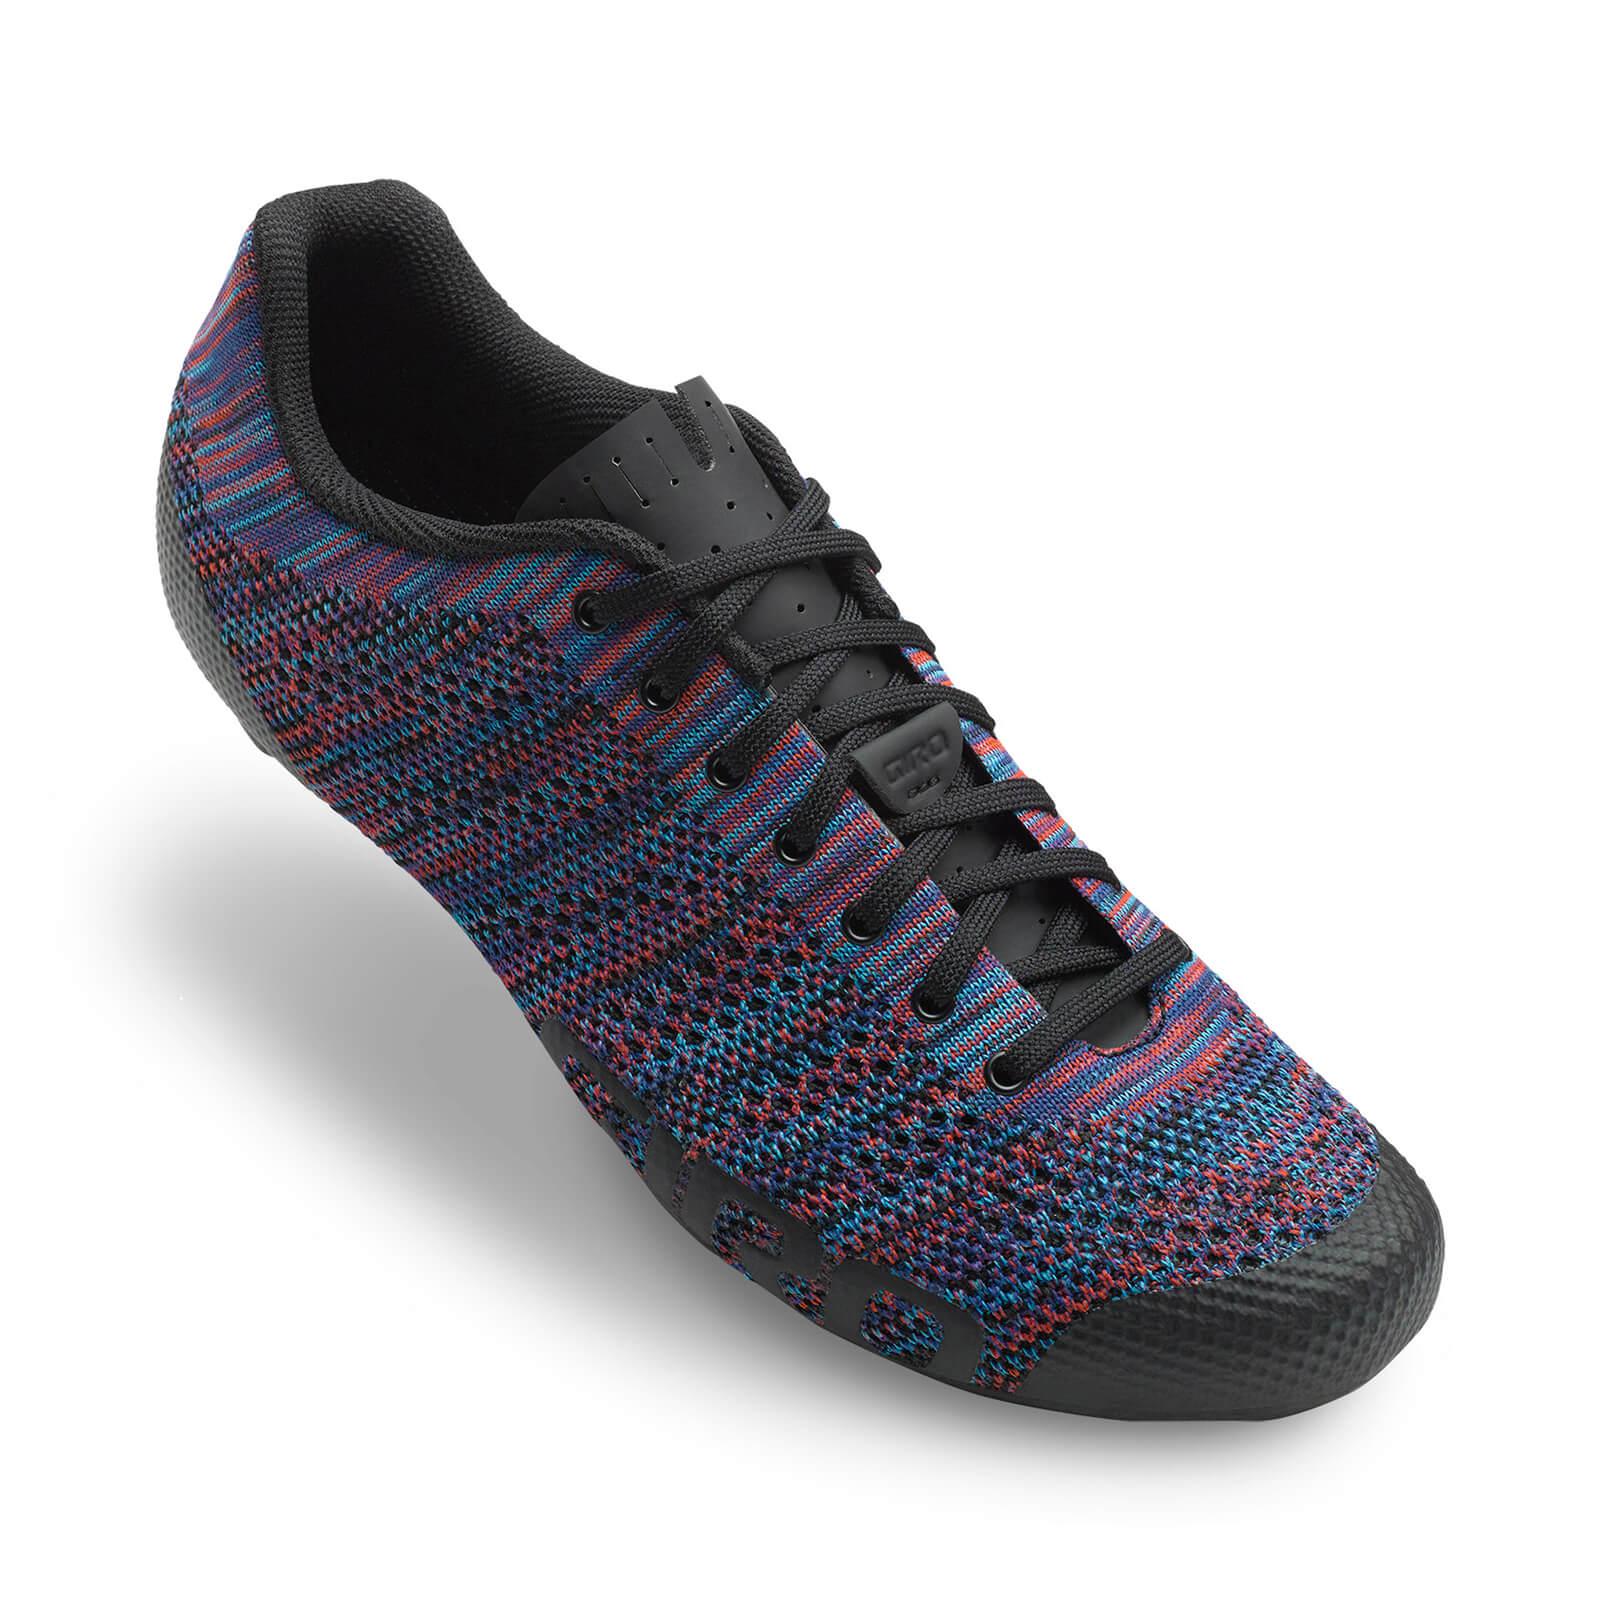 Giro Empire E70 Knit Road Cycling Shoes - Multicolour Heather - EU 48/UK 12.5 - Multi